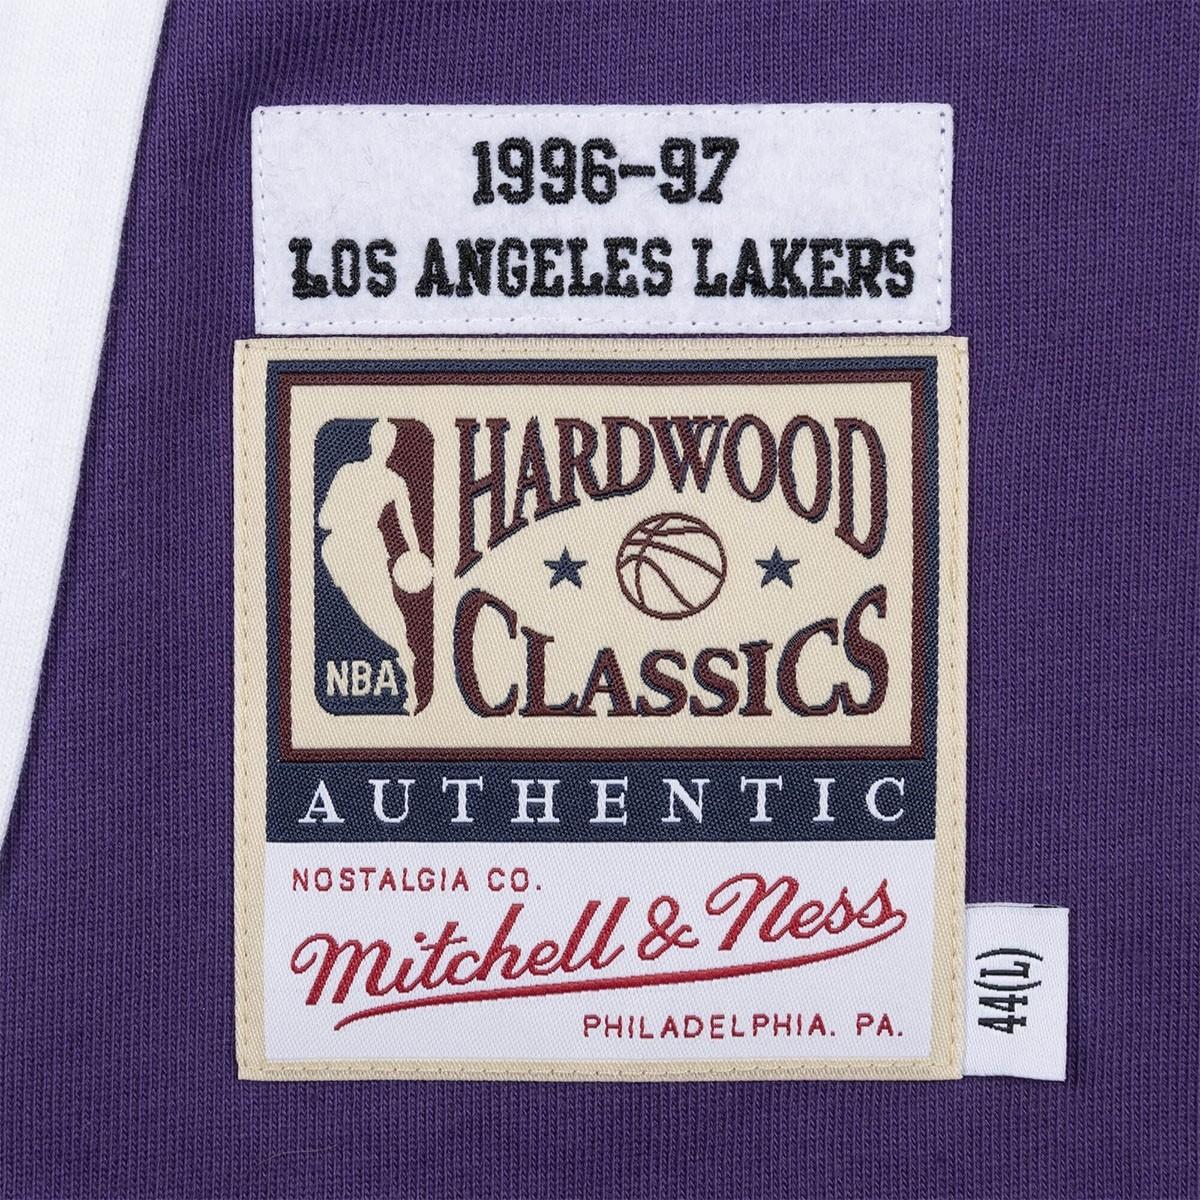 Authentic Shooting Shirt Los Angeles Lakers 1996-97 ASSHSB20005